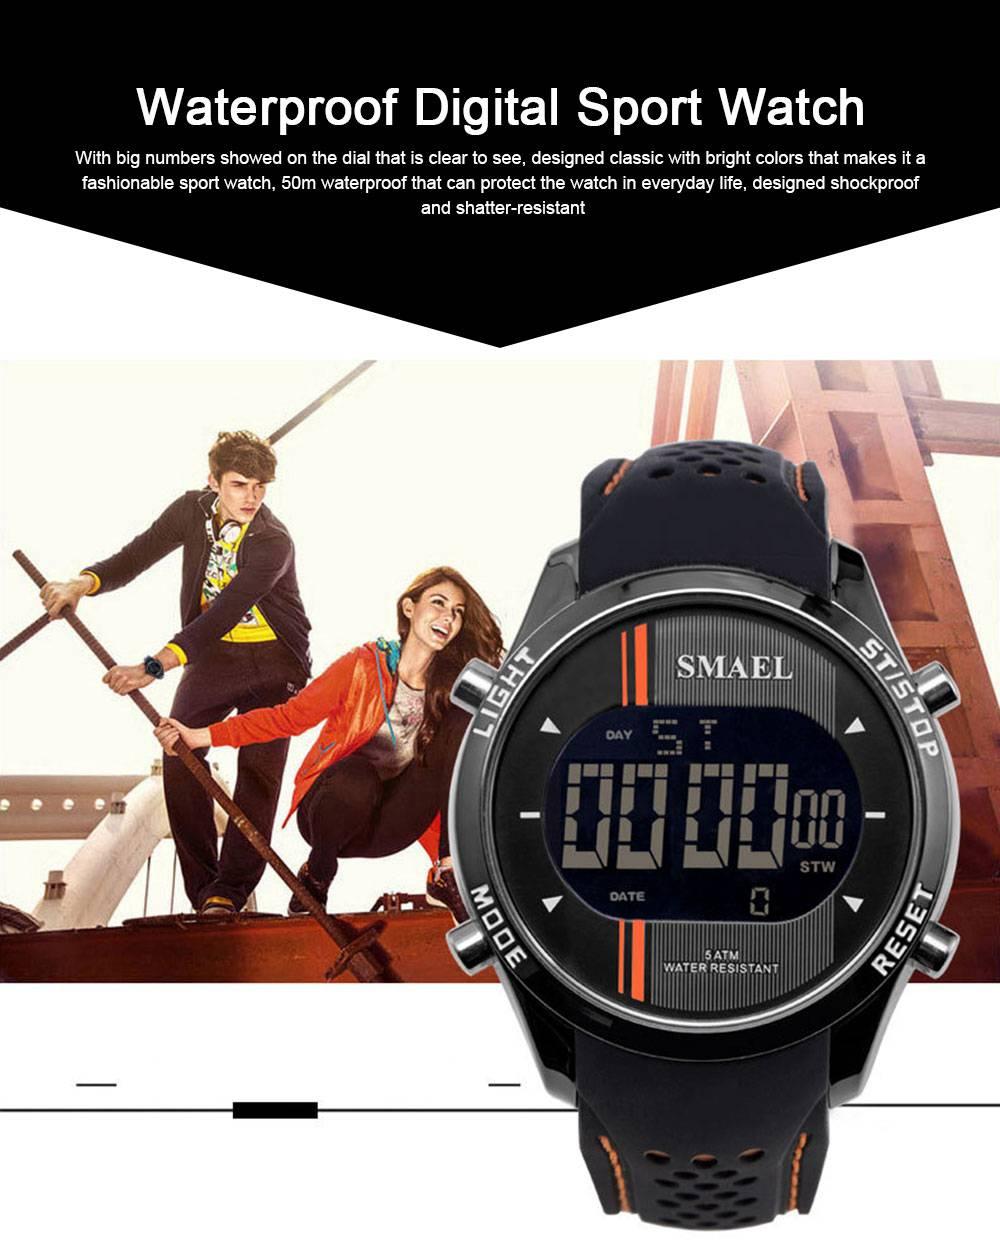 Digital Sport Watch for Men, Multifunctional Smartwatch 50M Waterproof Outdoors Watch 0